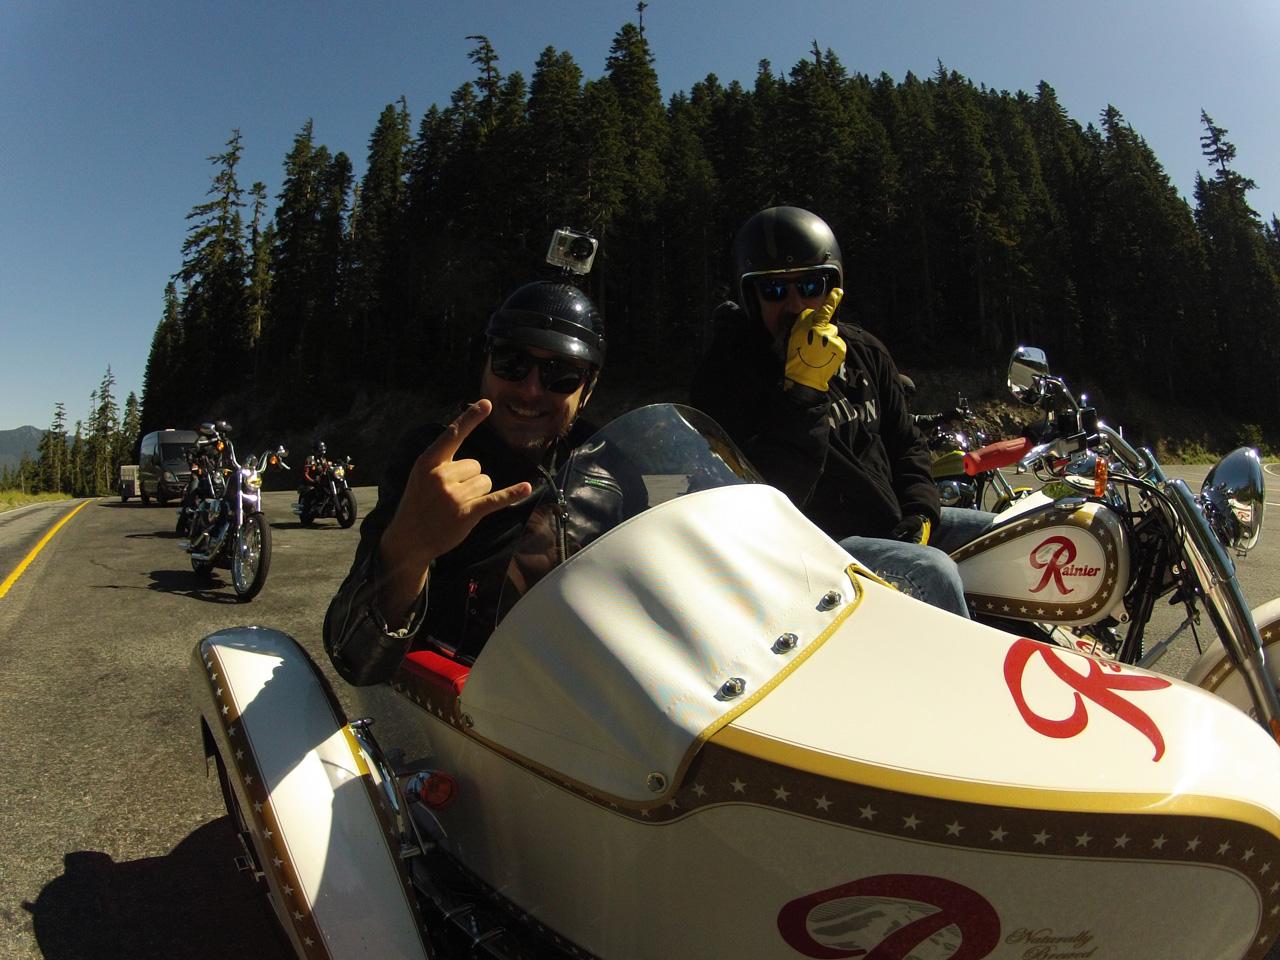 Riding through Mount Rainier National Park